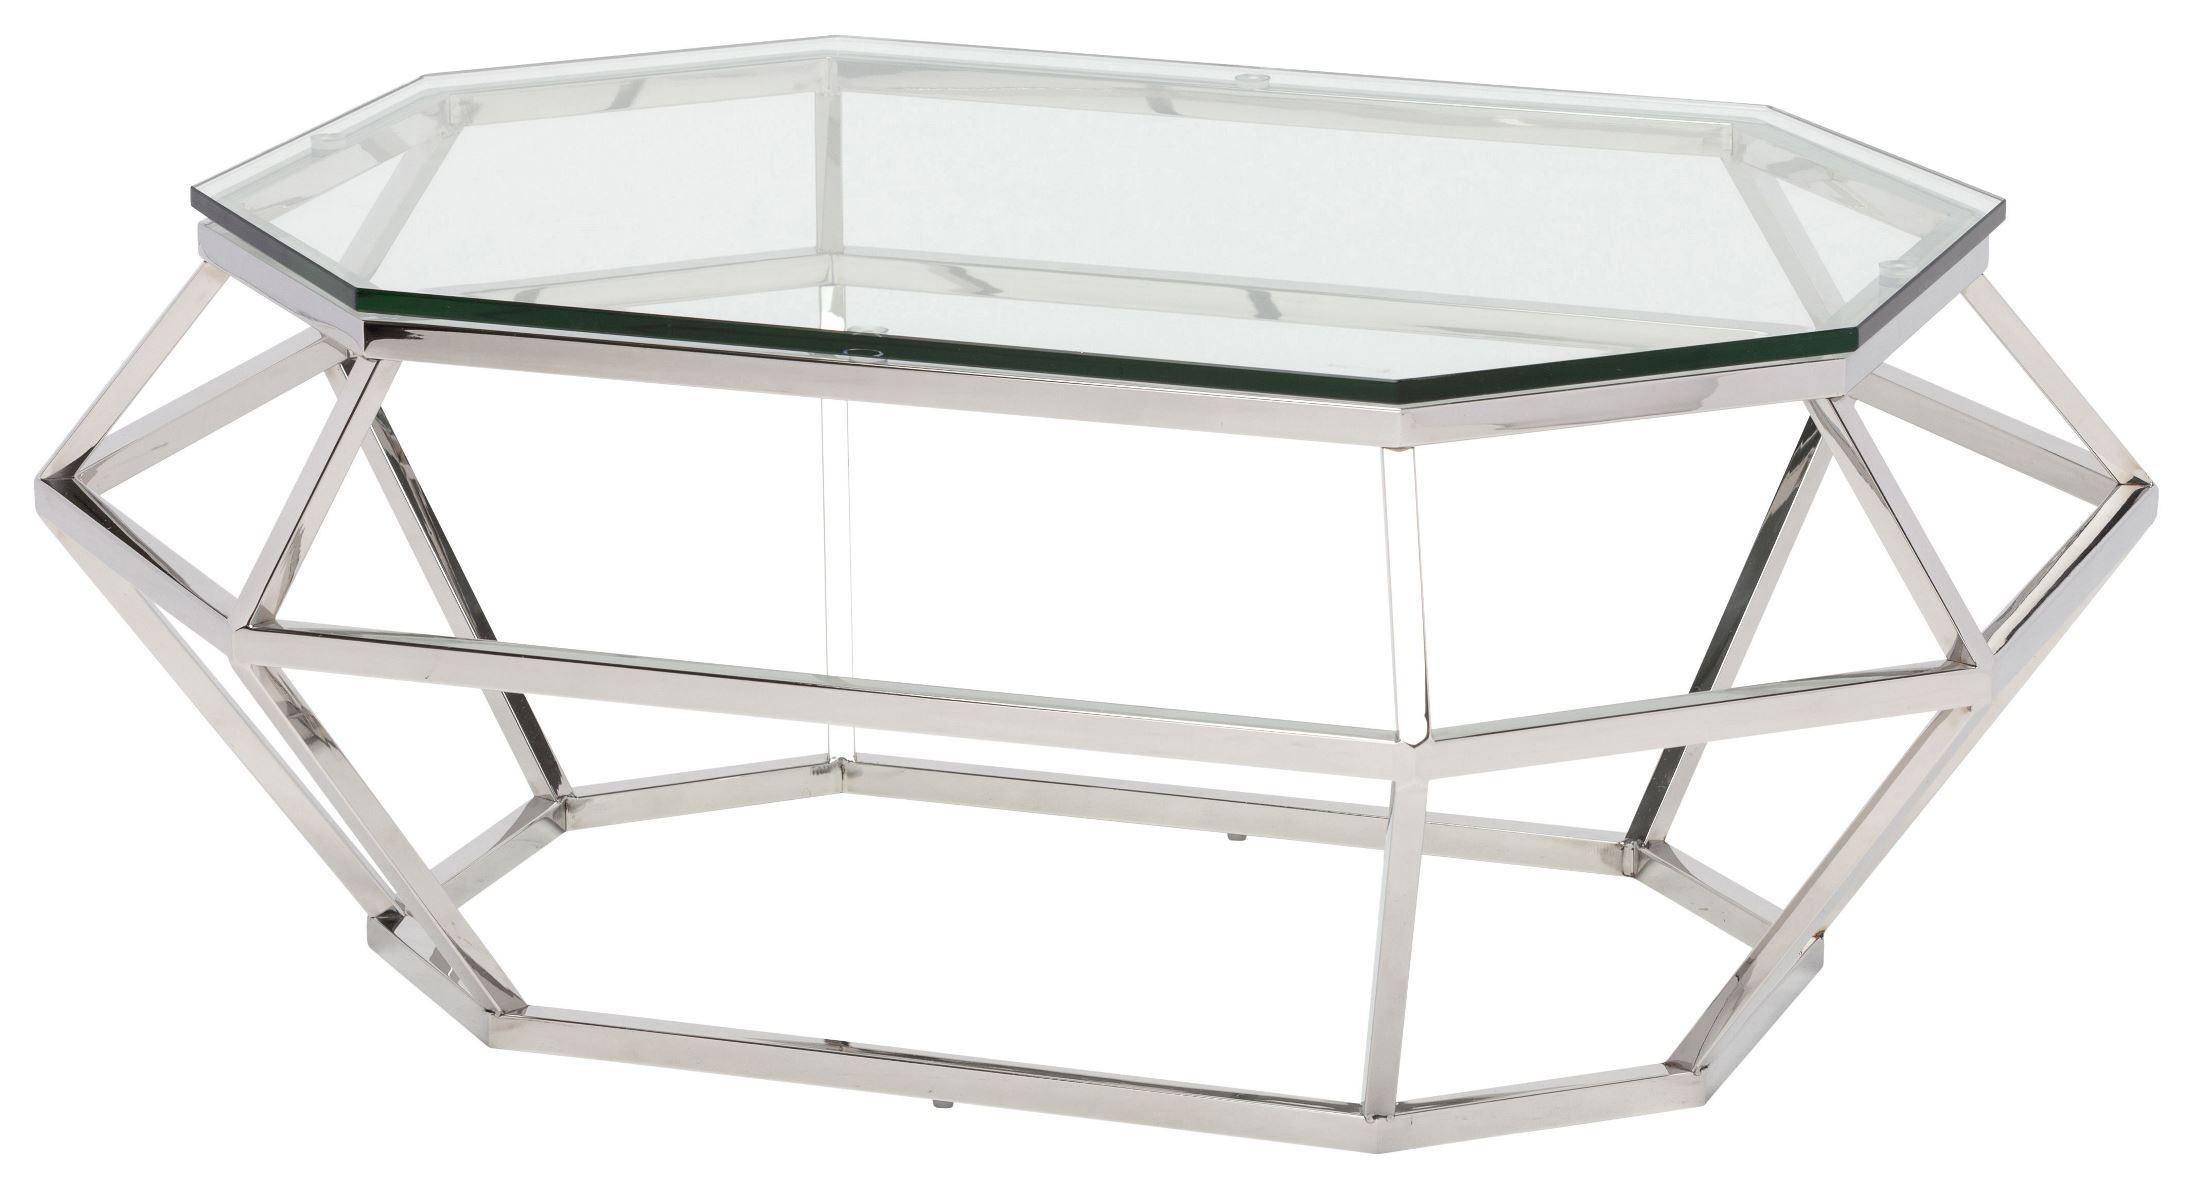 diamond clear glass coffee table hgsx183 nuevo. Black Bedroom Furniture Sets. Home Design Ideas